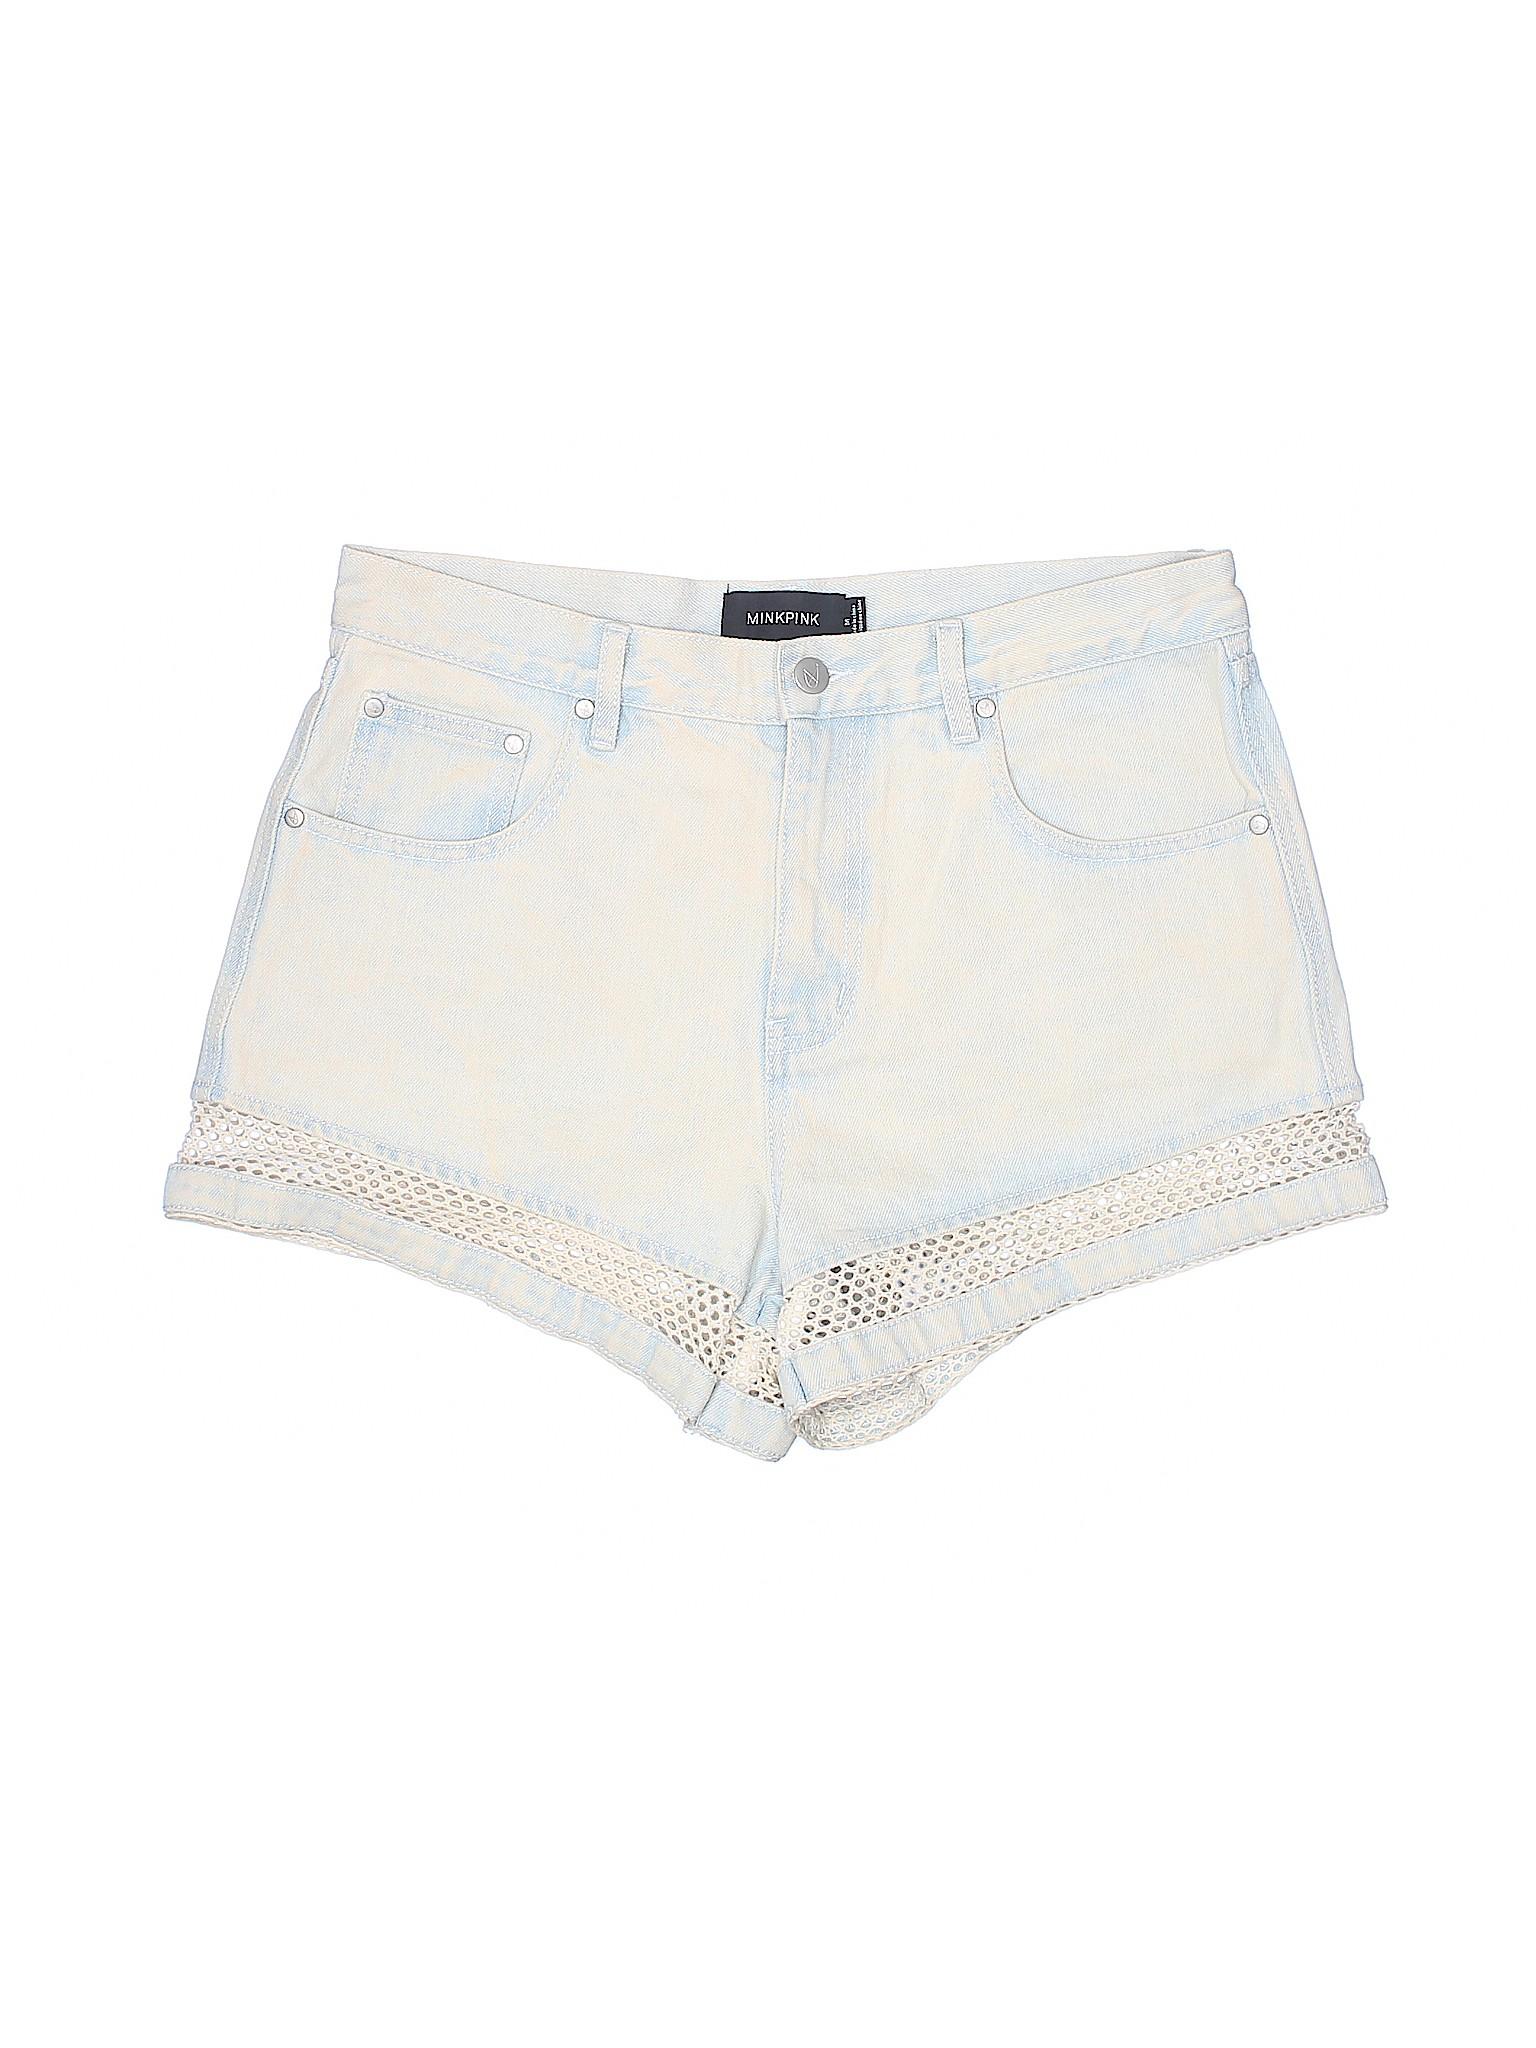 Pink Mink Boutique Shorts Denim Denim Shorts Boutique Mink Pink FtxwH